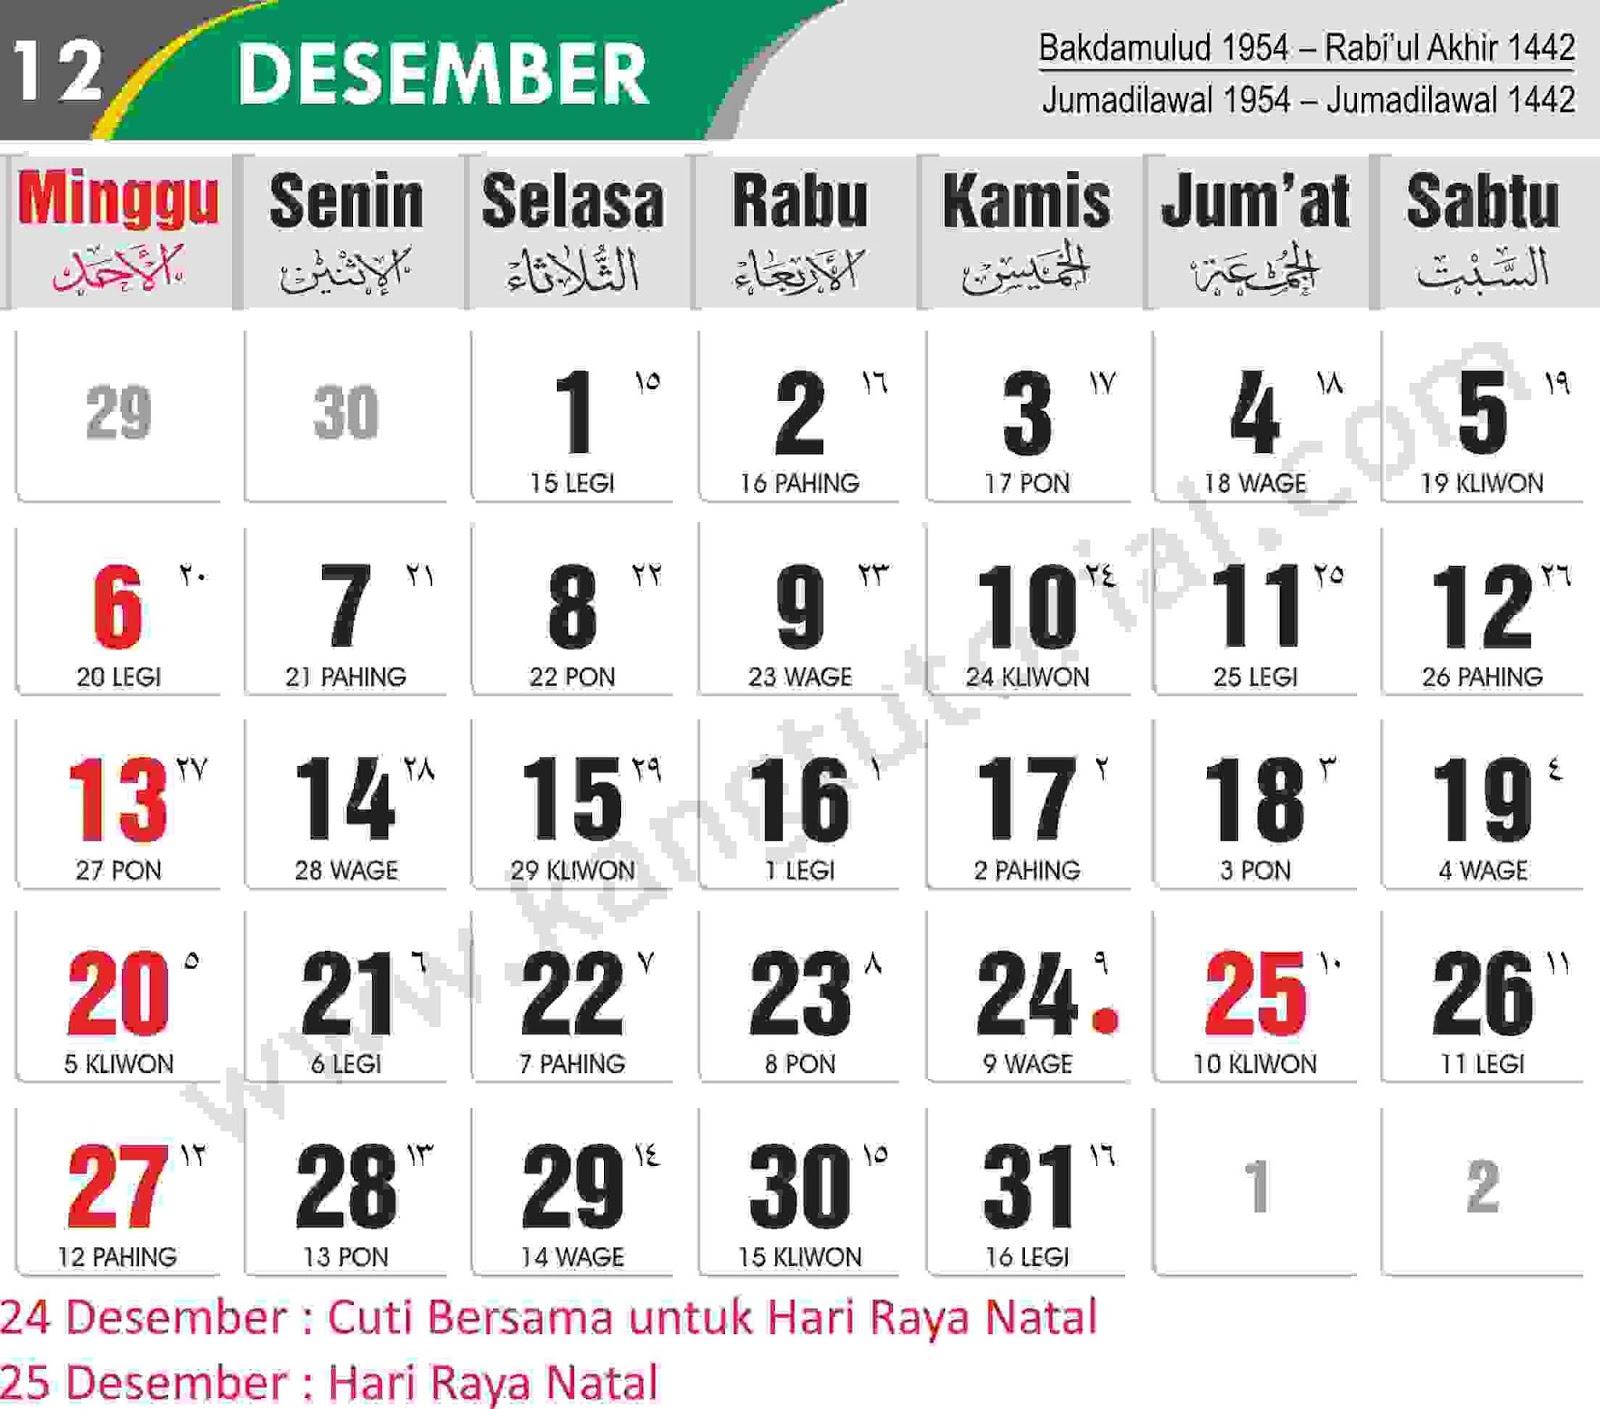 Download Kalender 2020 Gratis Dan Lengkap - Kangtutorial